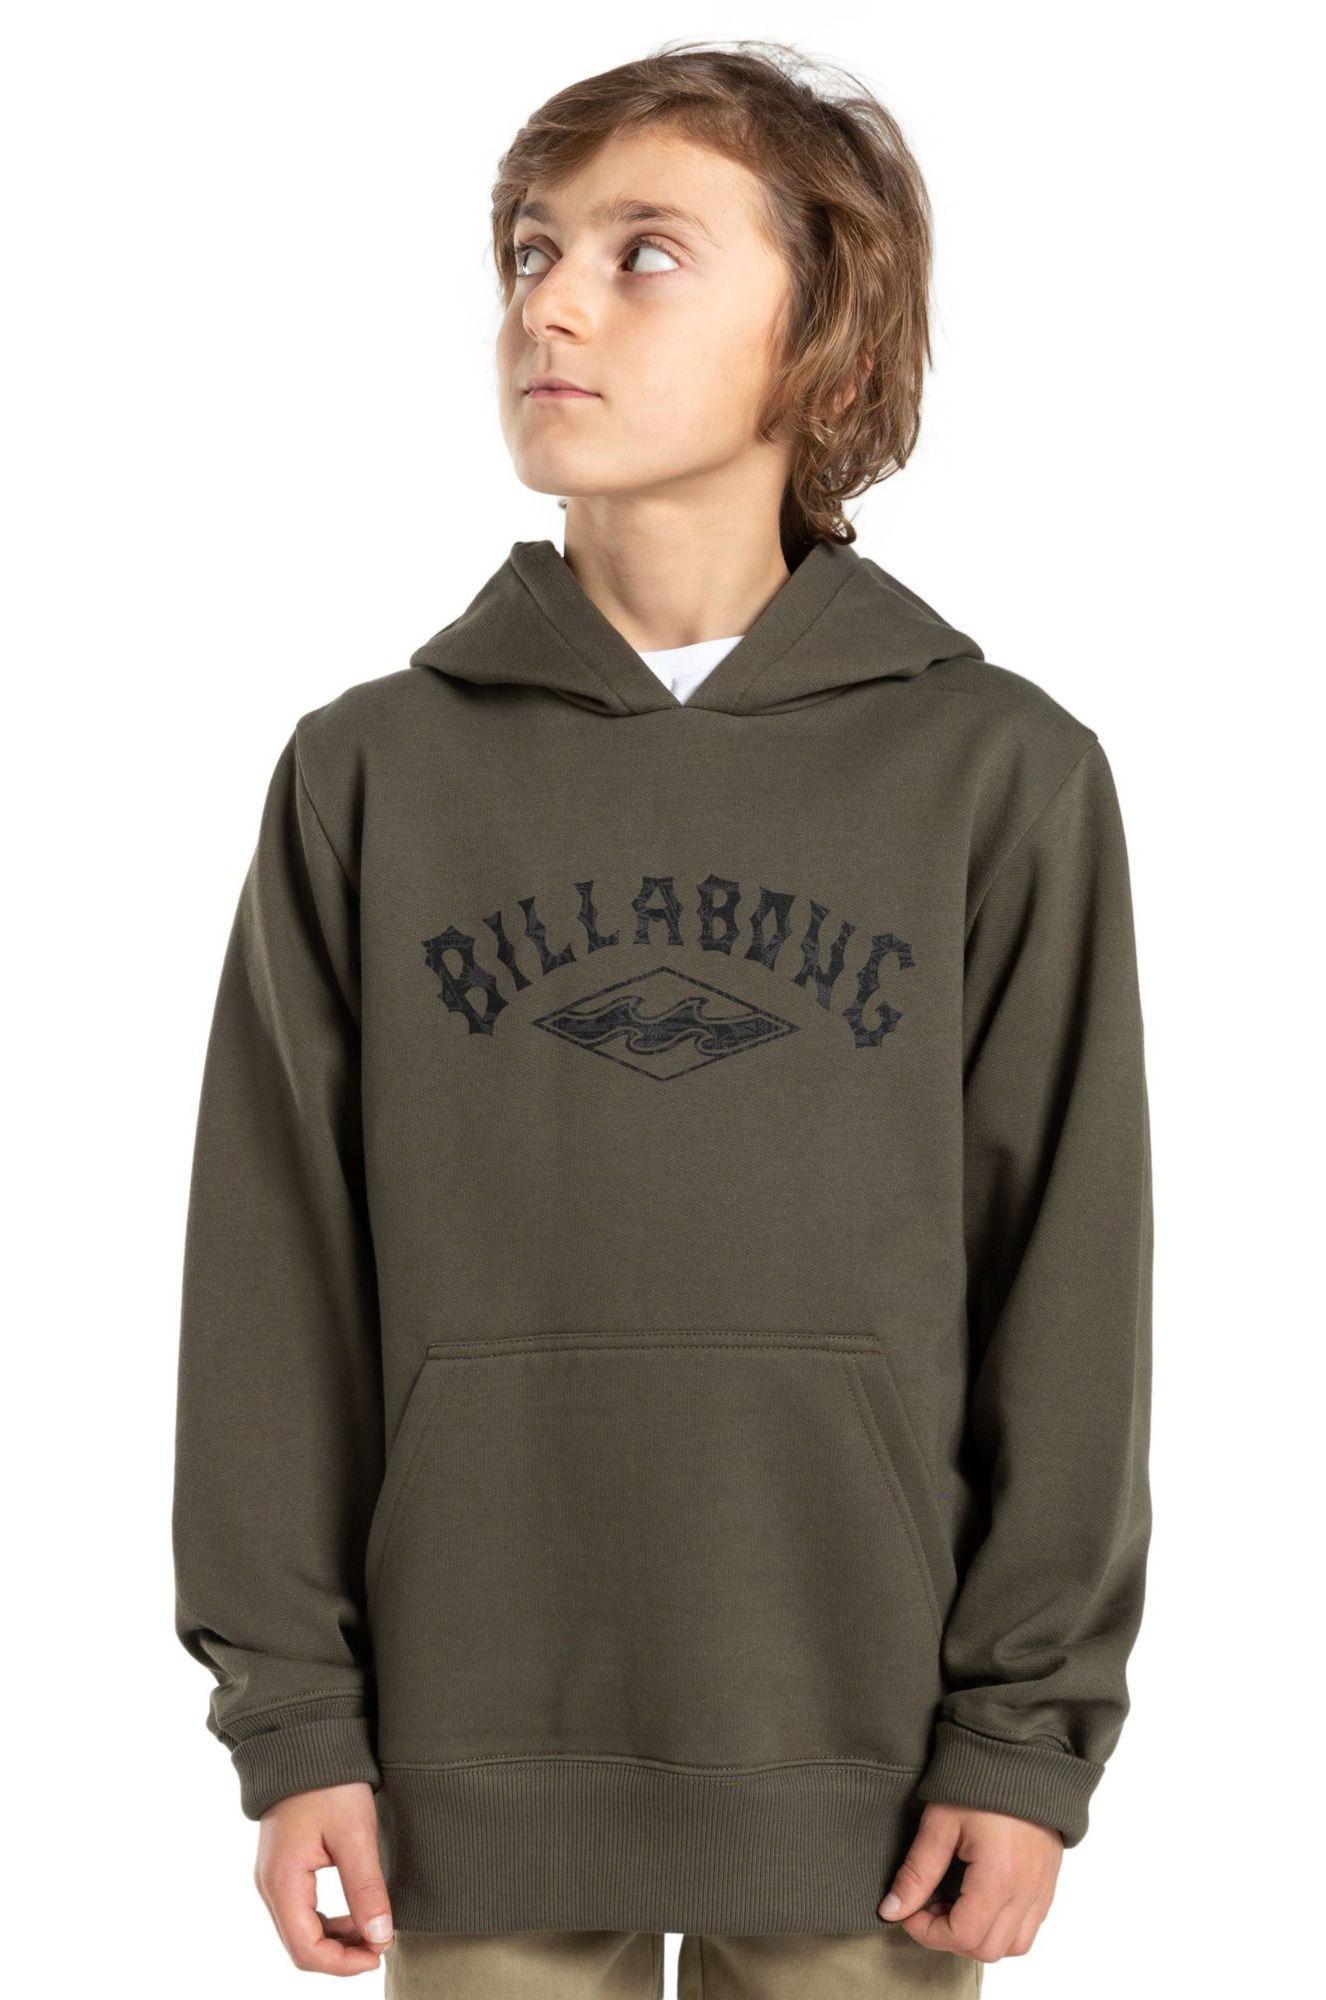 Billabong Sweat Hood ARCH ORIGIN PO BOY SPORTING GOOD PROGR. Military